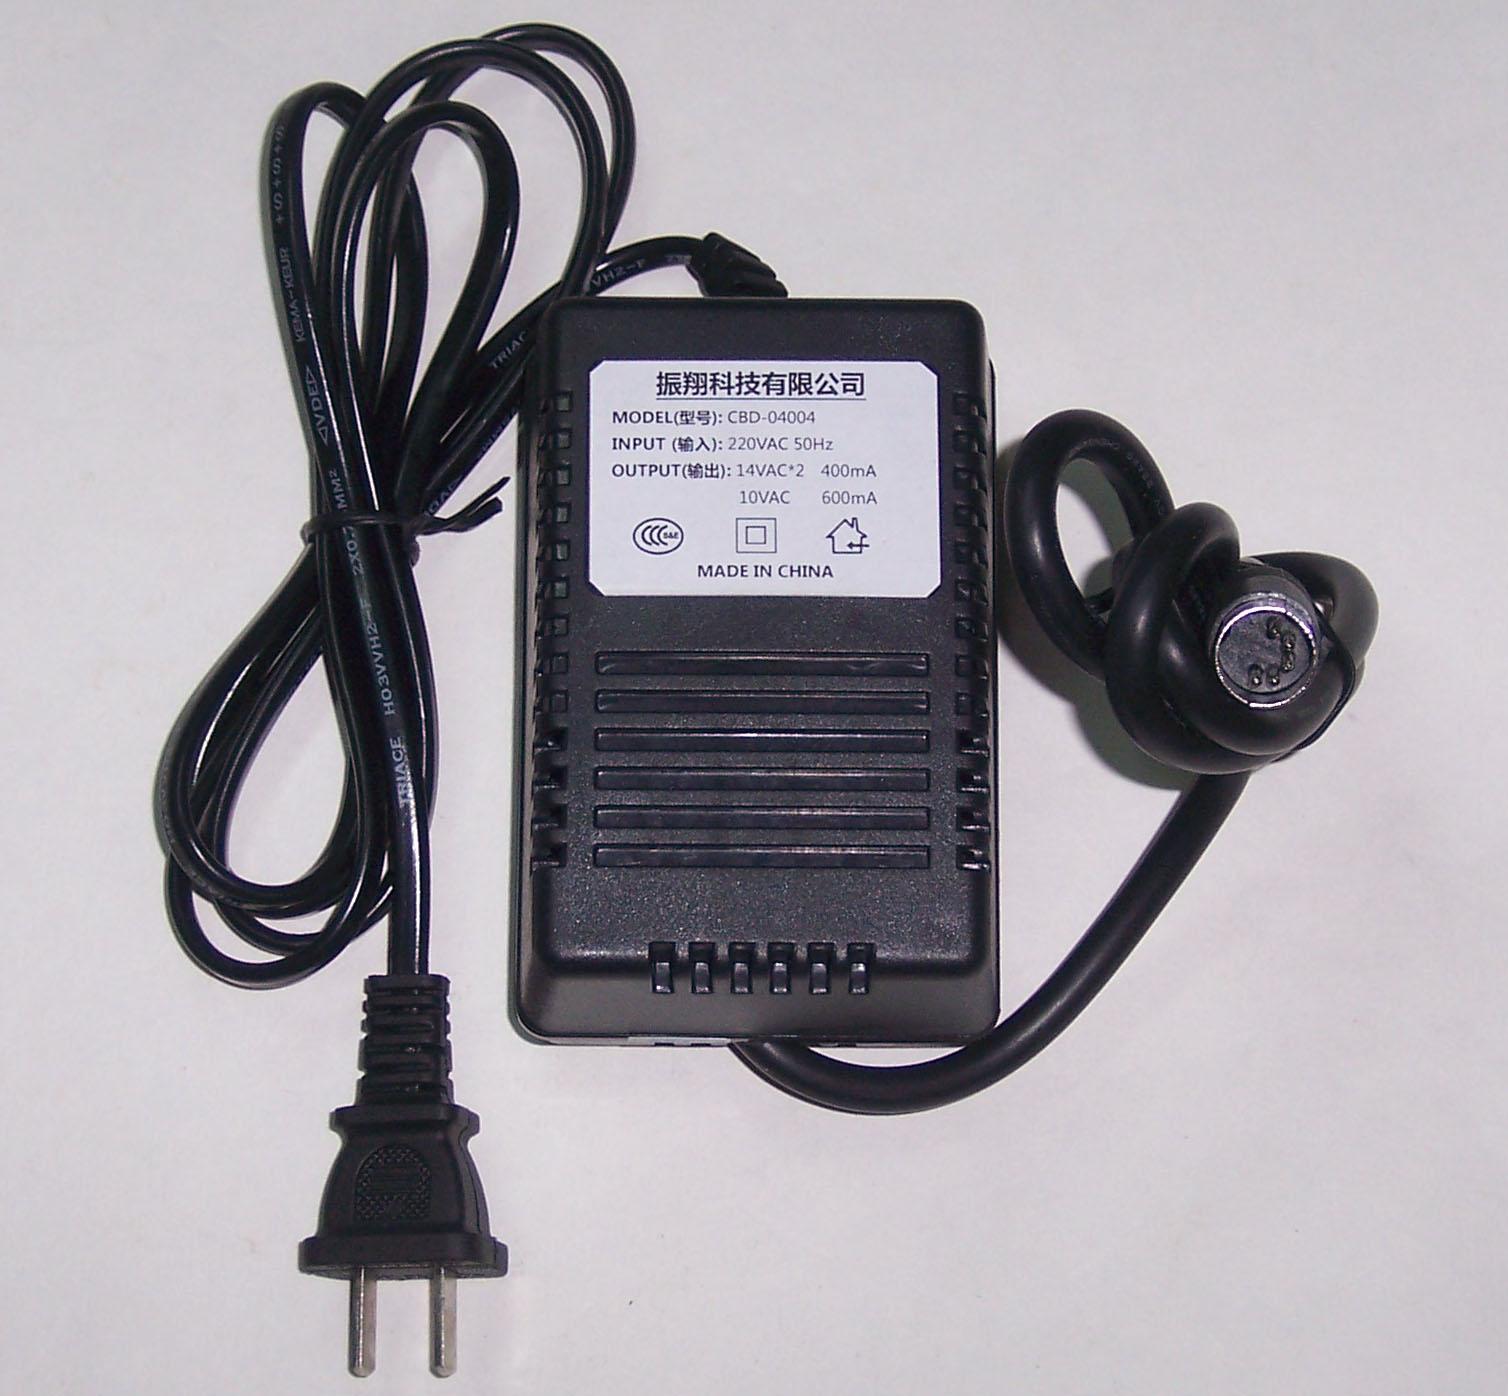 Non-original JSG PK8800/Vose DSP-8000/DK8000 Effects Universal Power Transformer